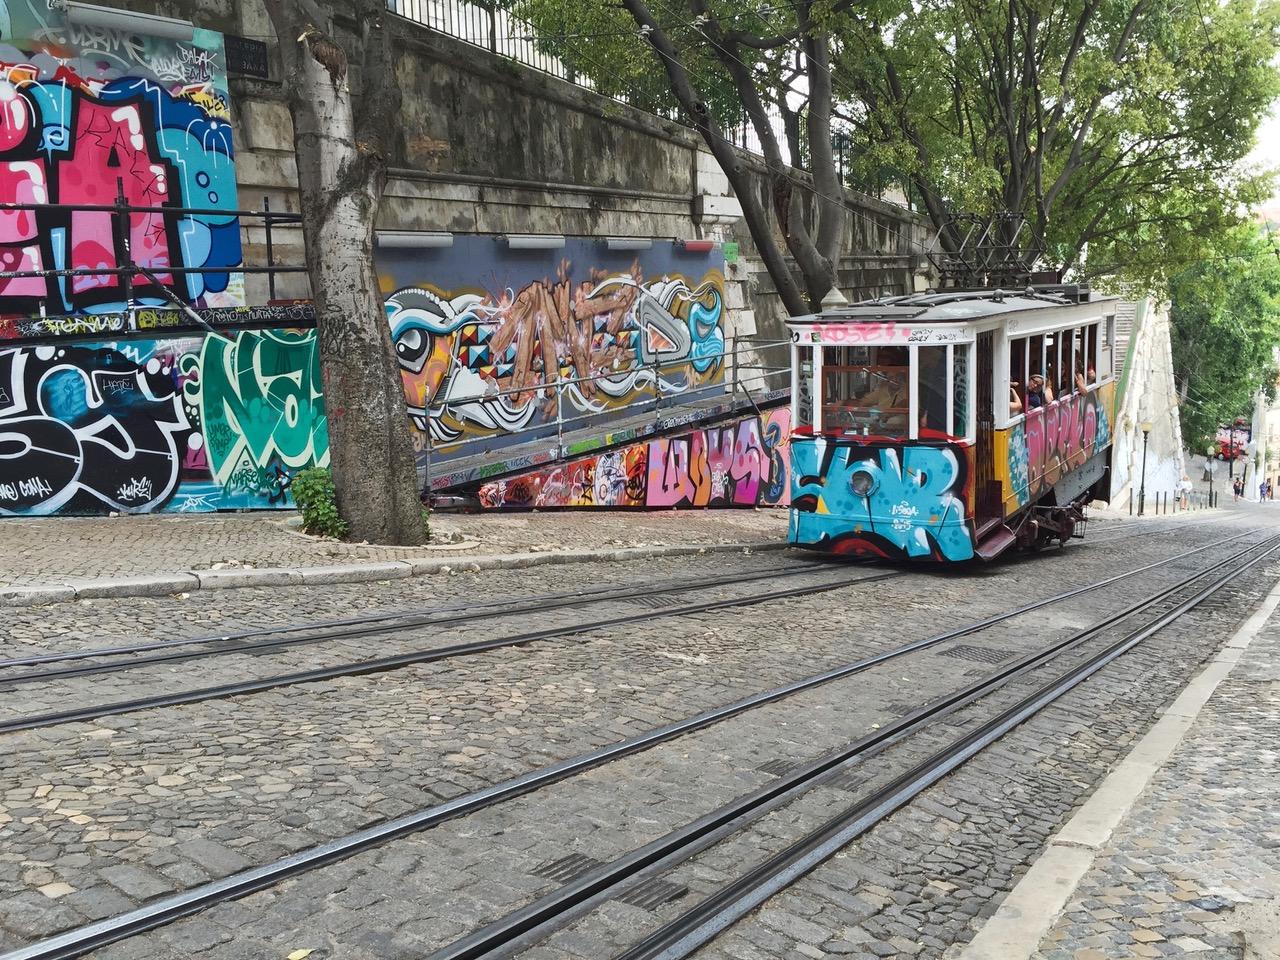 Typical Lisbon tram